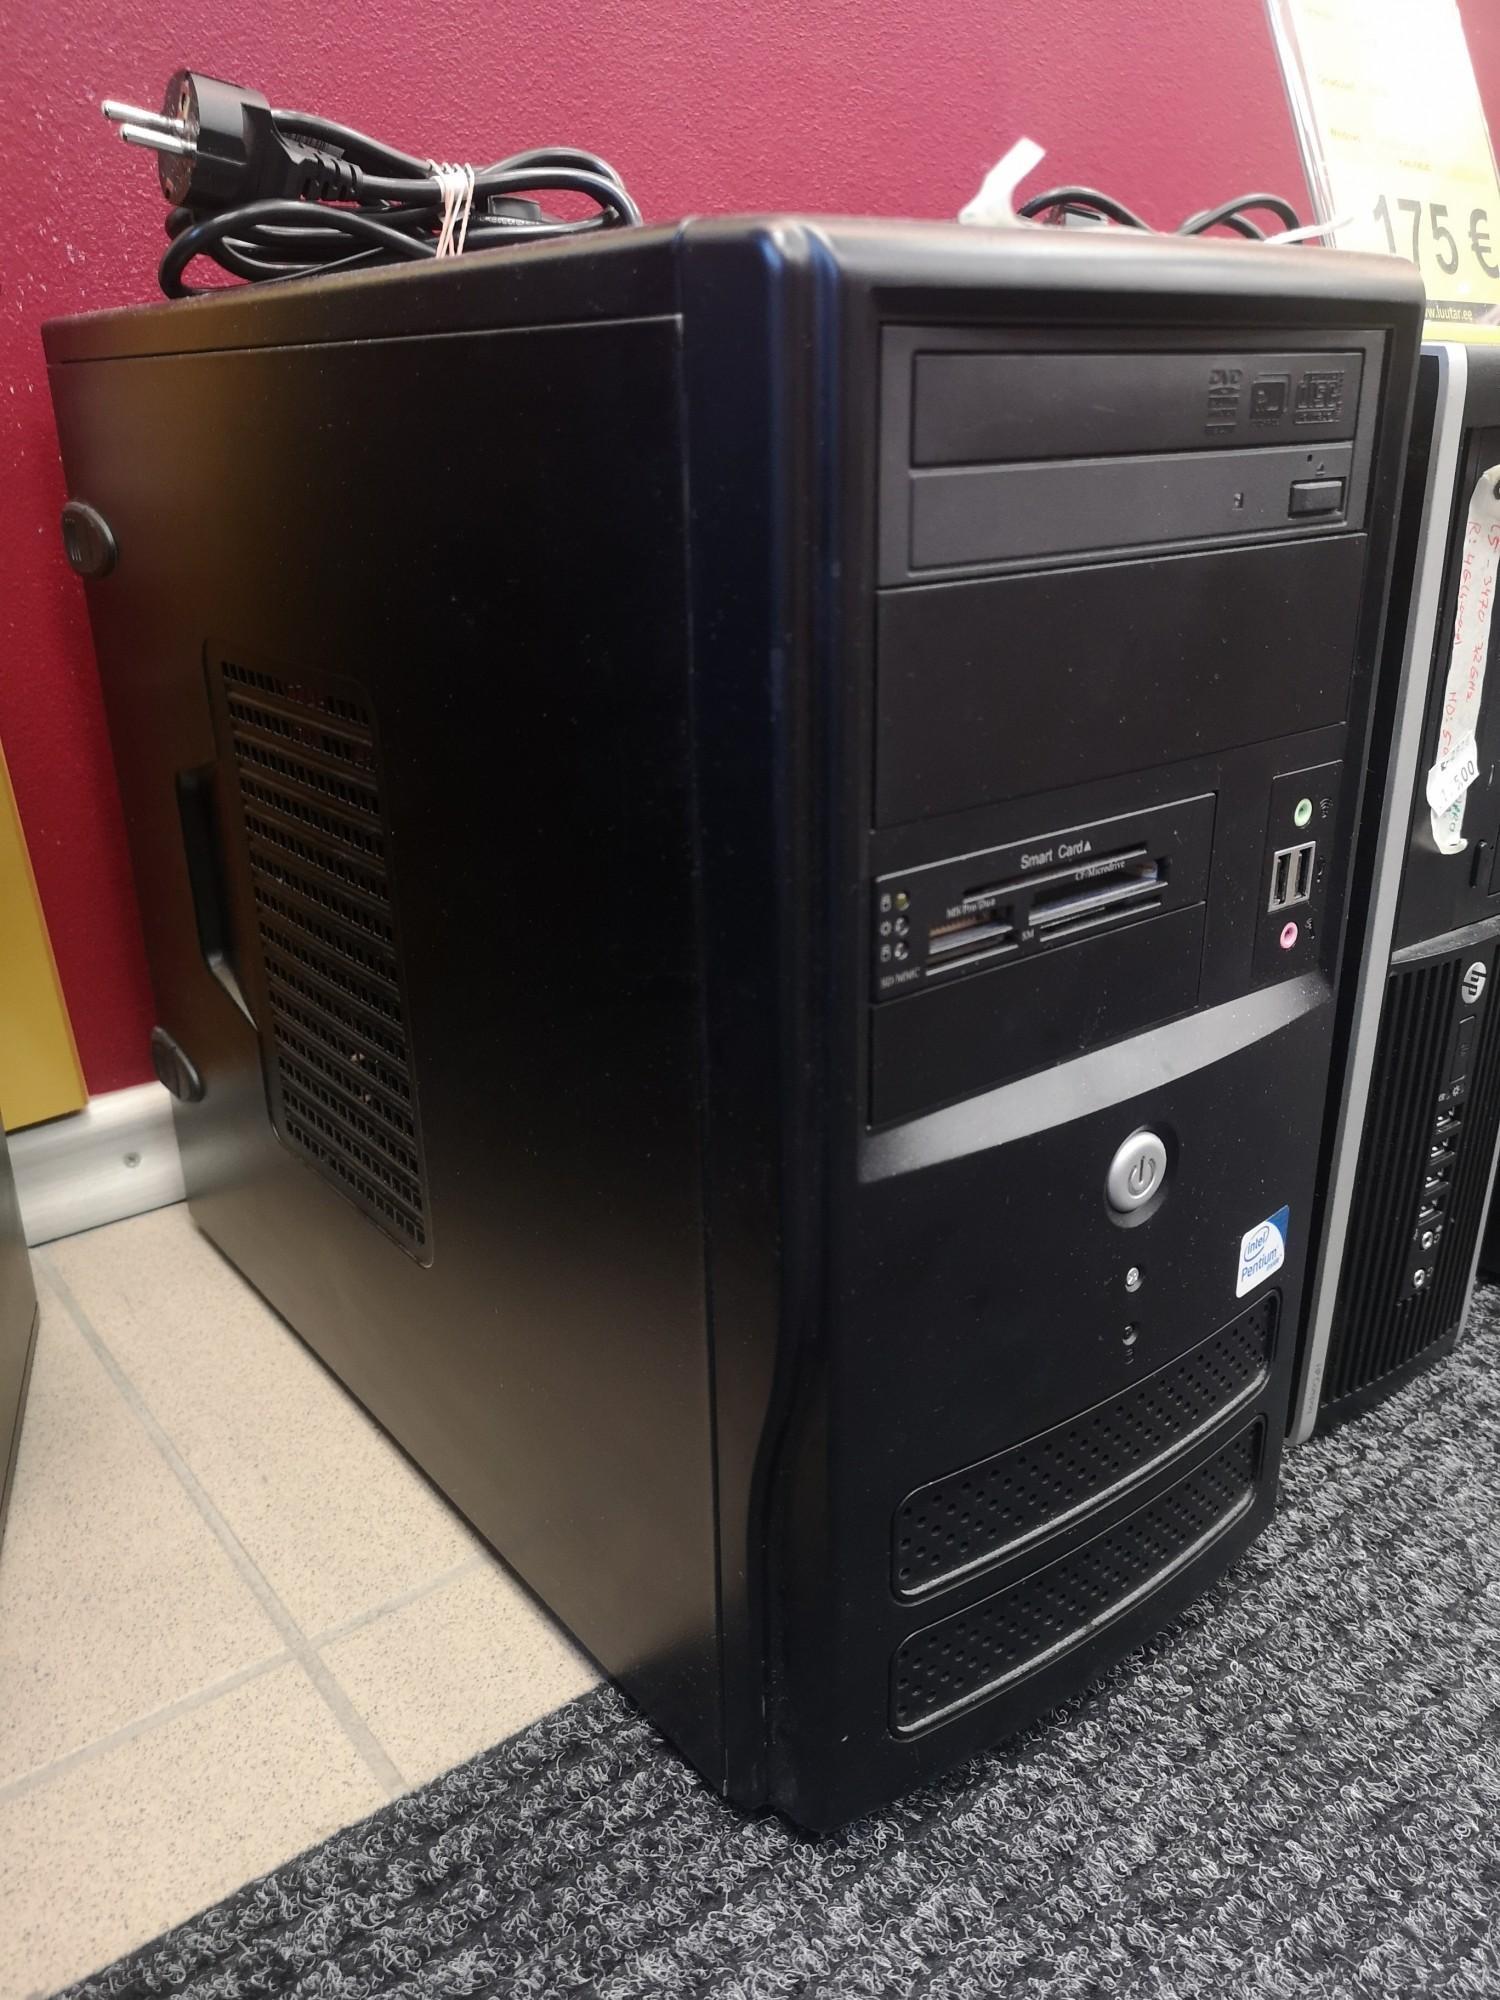 3f21f8e6a66 Lauaarvuti Pentium G620 - Luutar